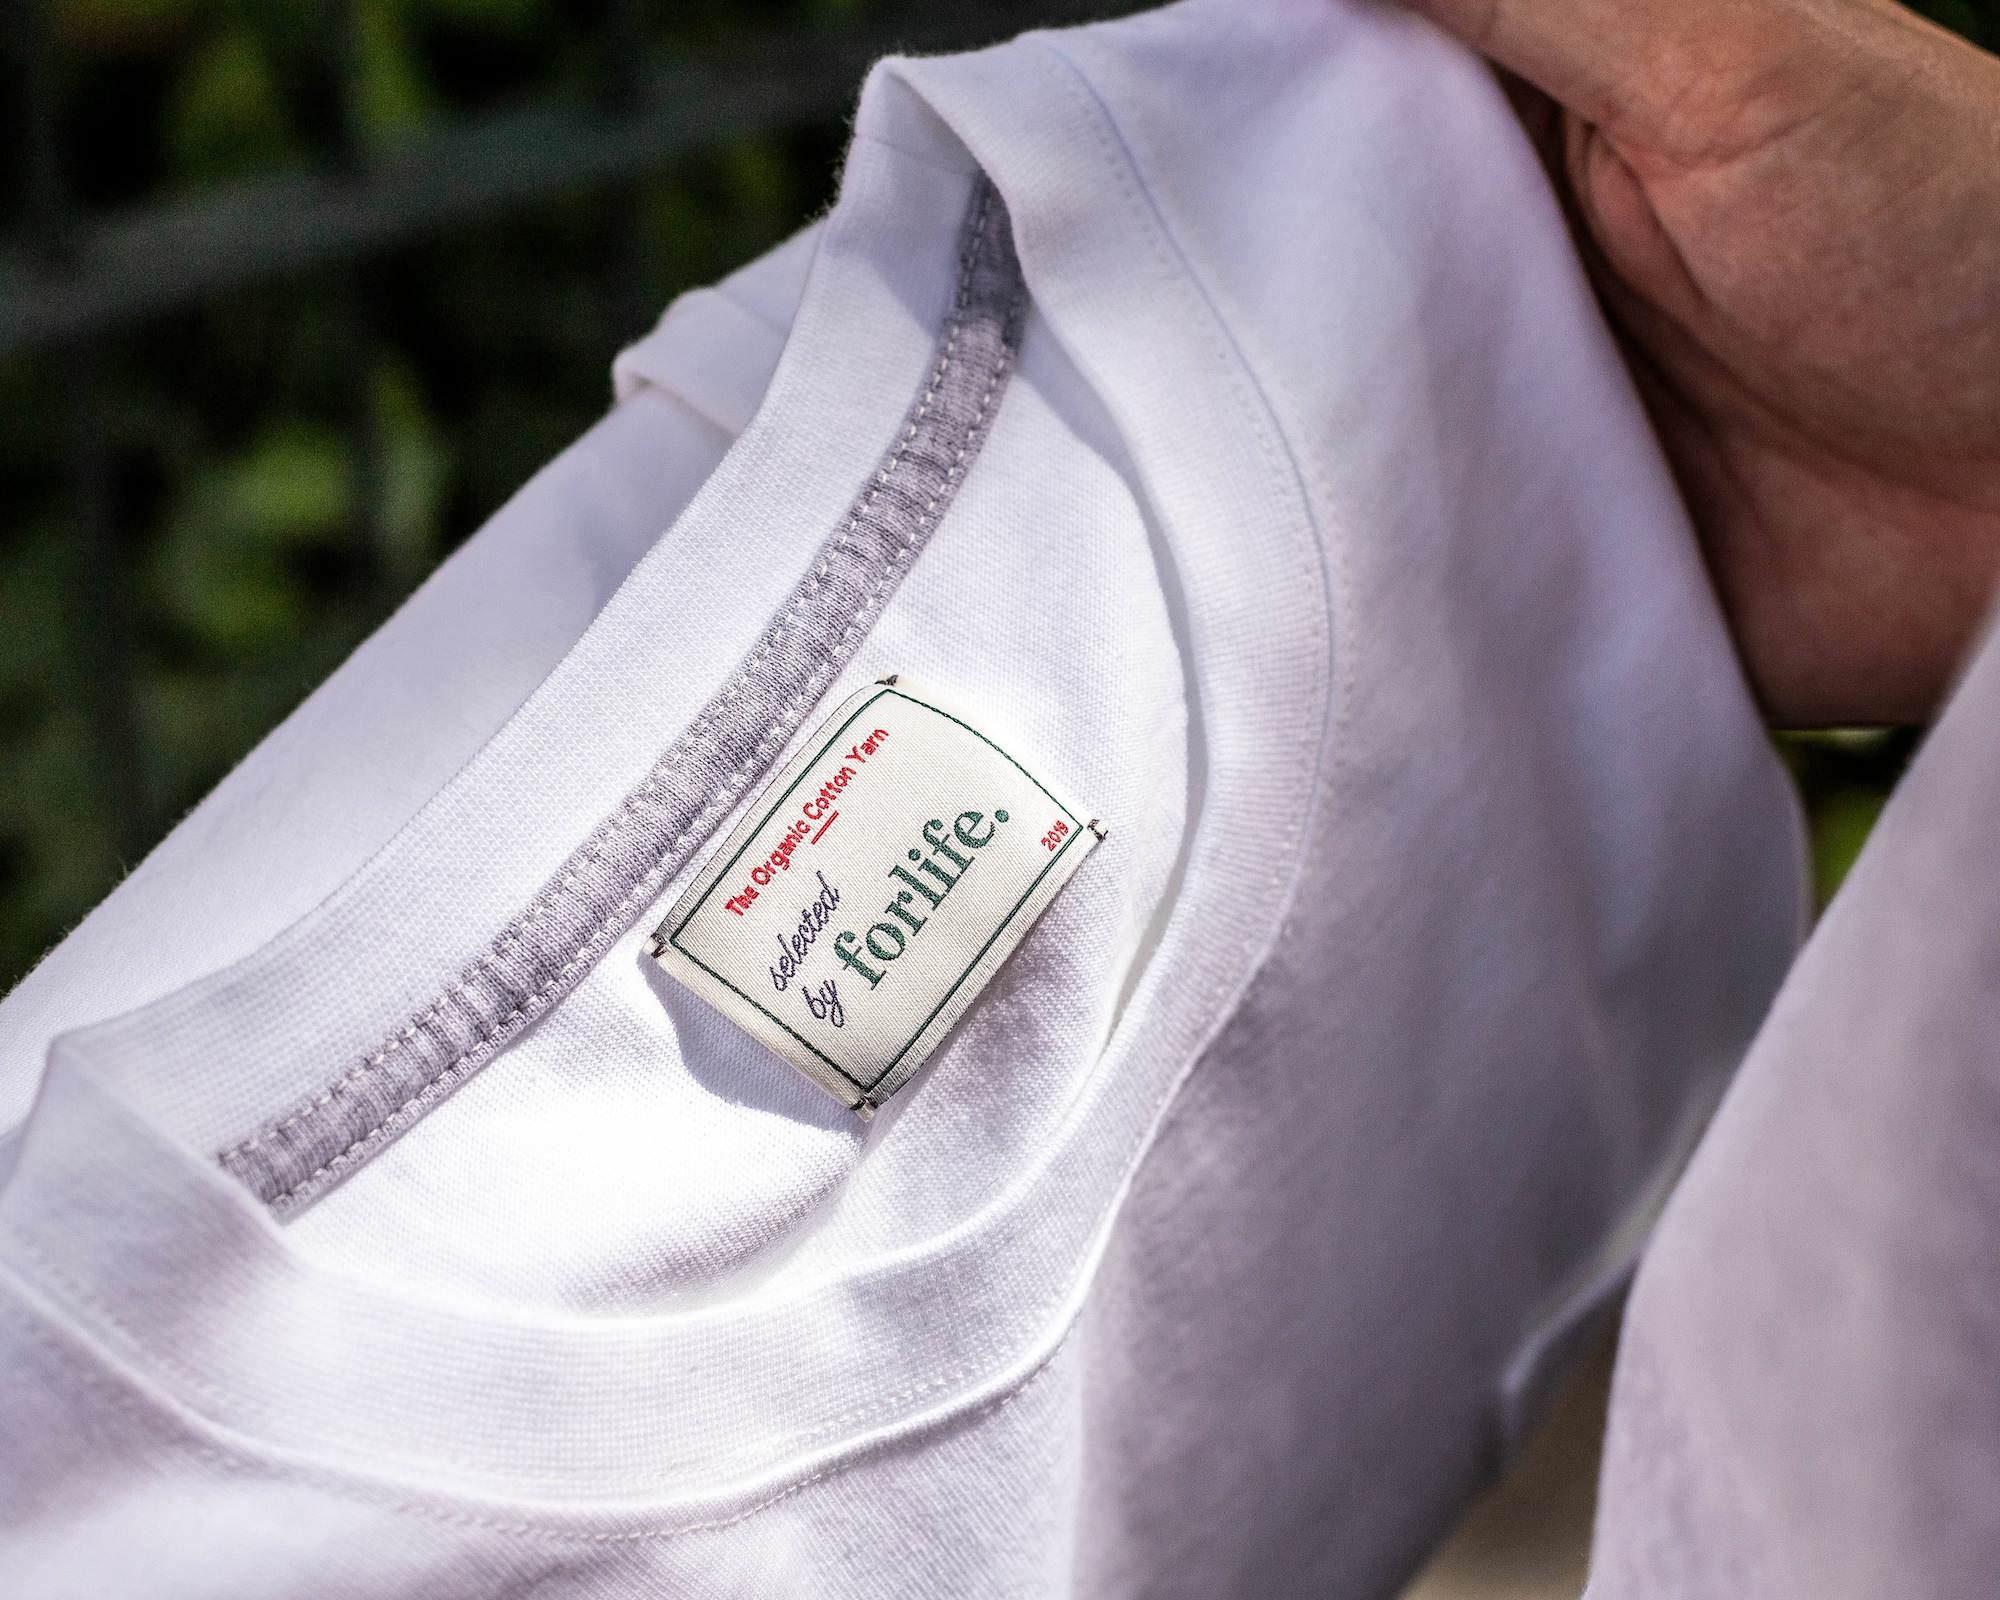 etiquette forlife tshirt